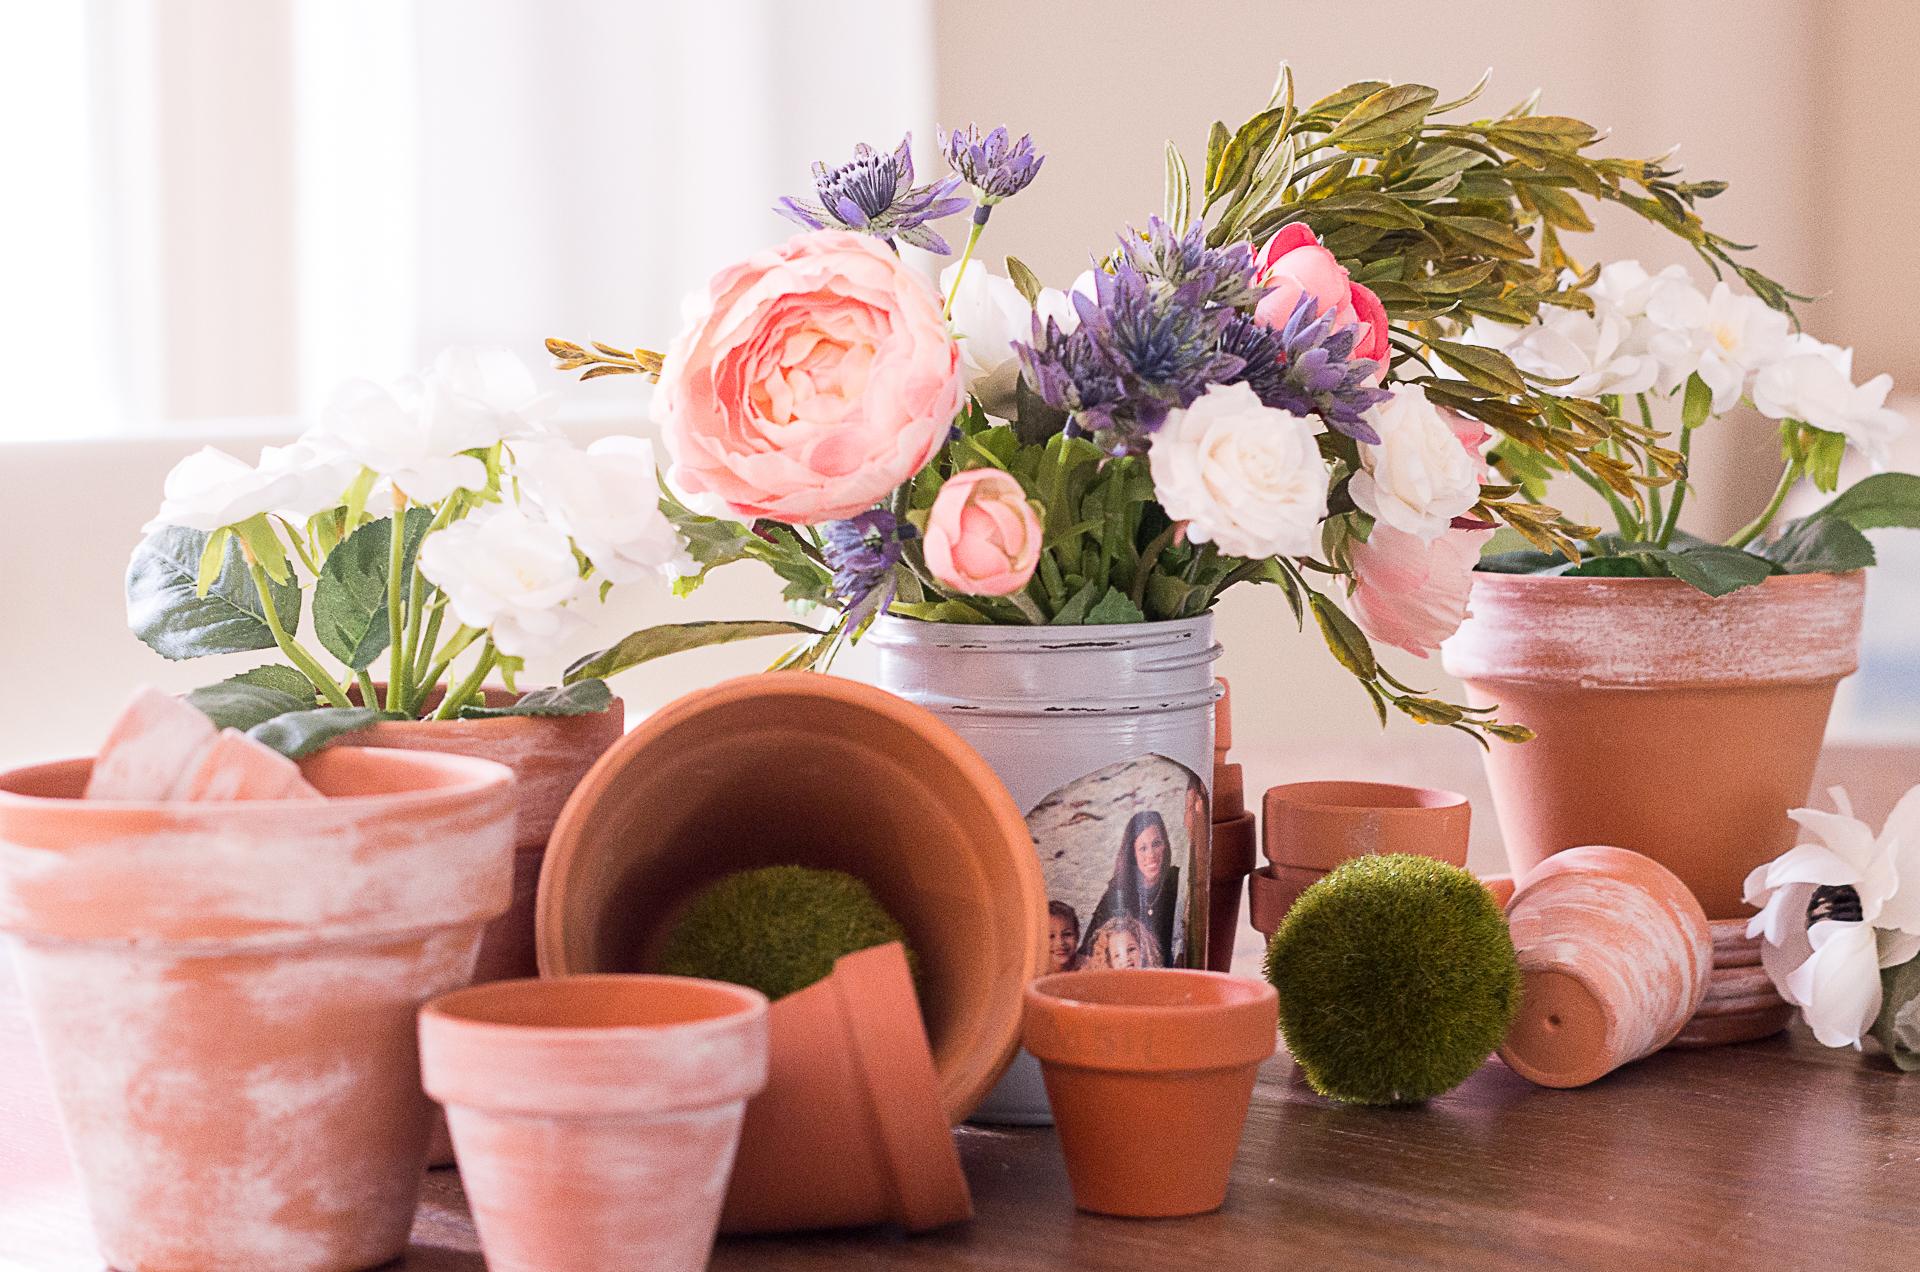 Diy mason jar vases mom will love cutout card craft picture frame mason jar vase flowers pots reviewsmspy